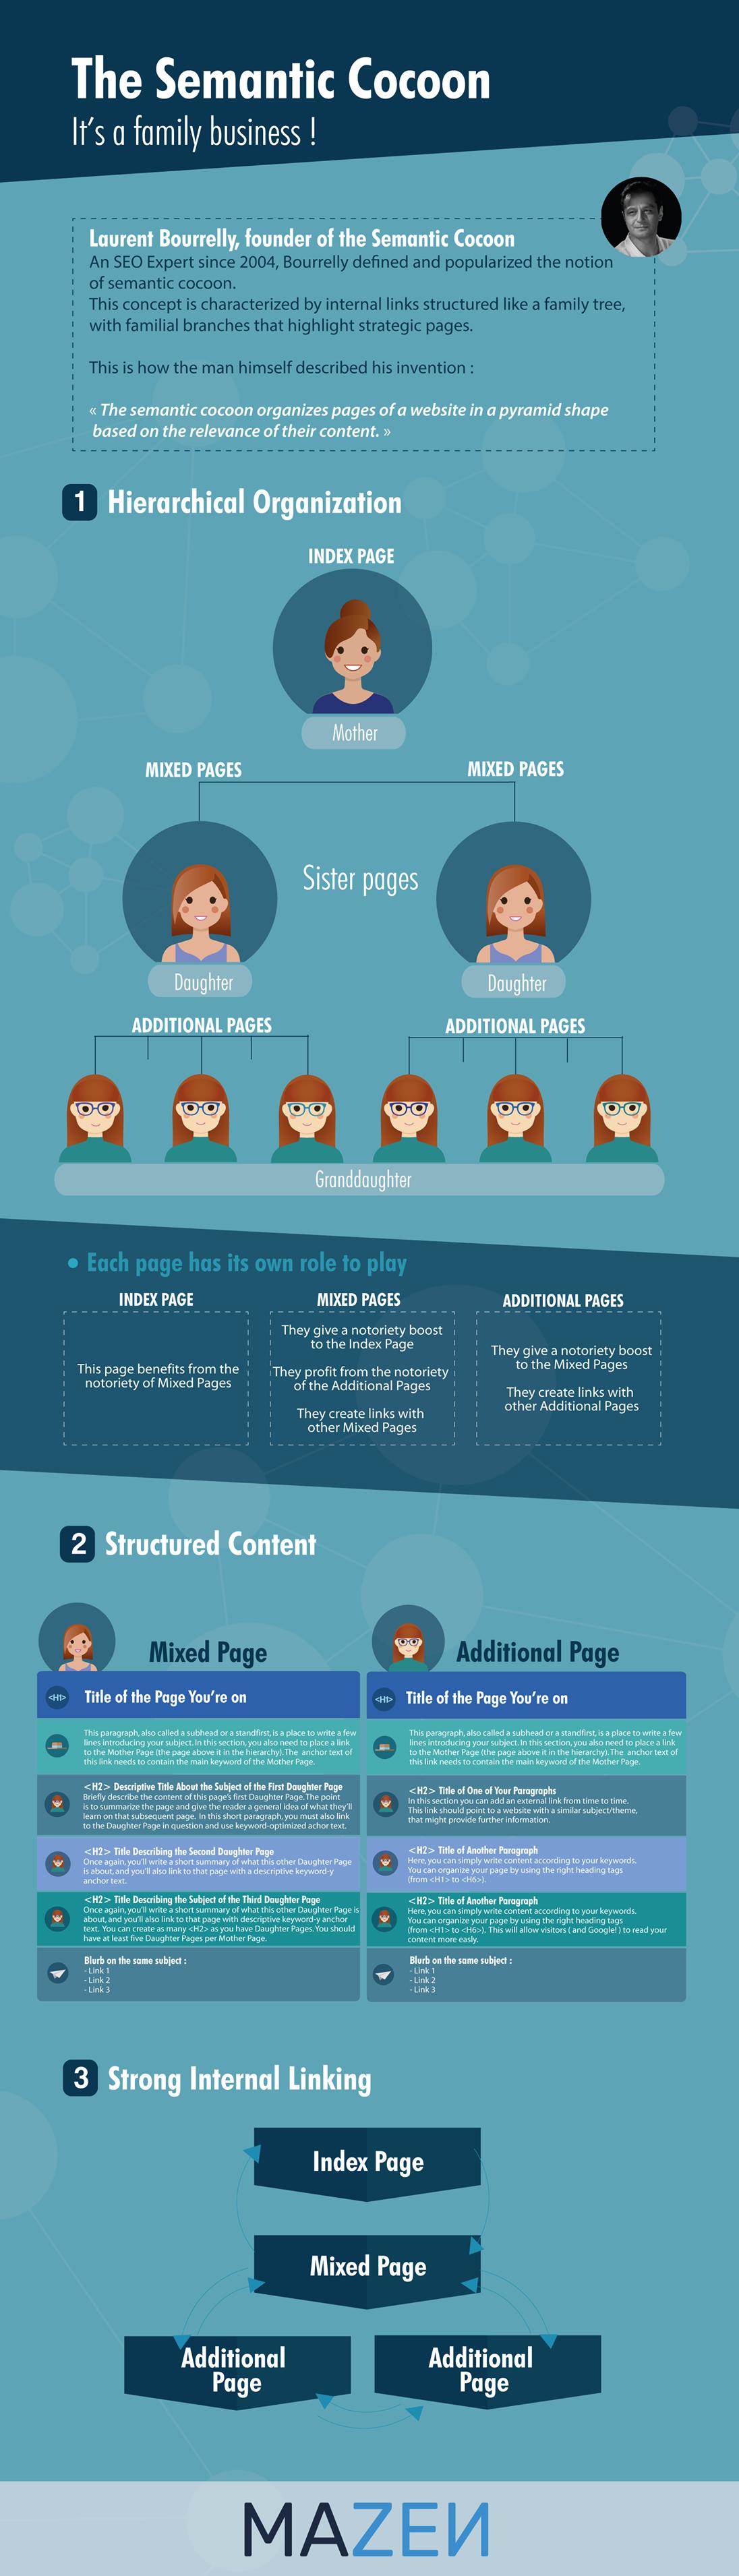 the semantic cocoon infographic